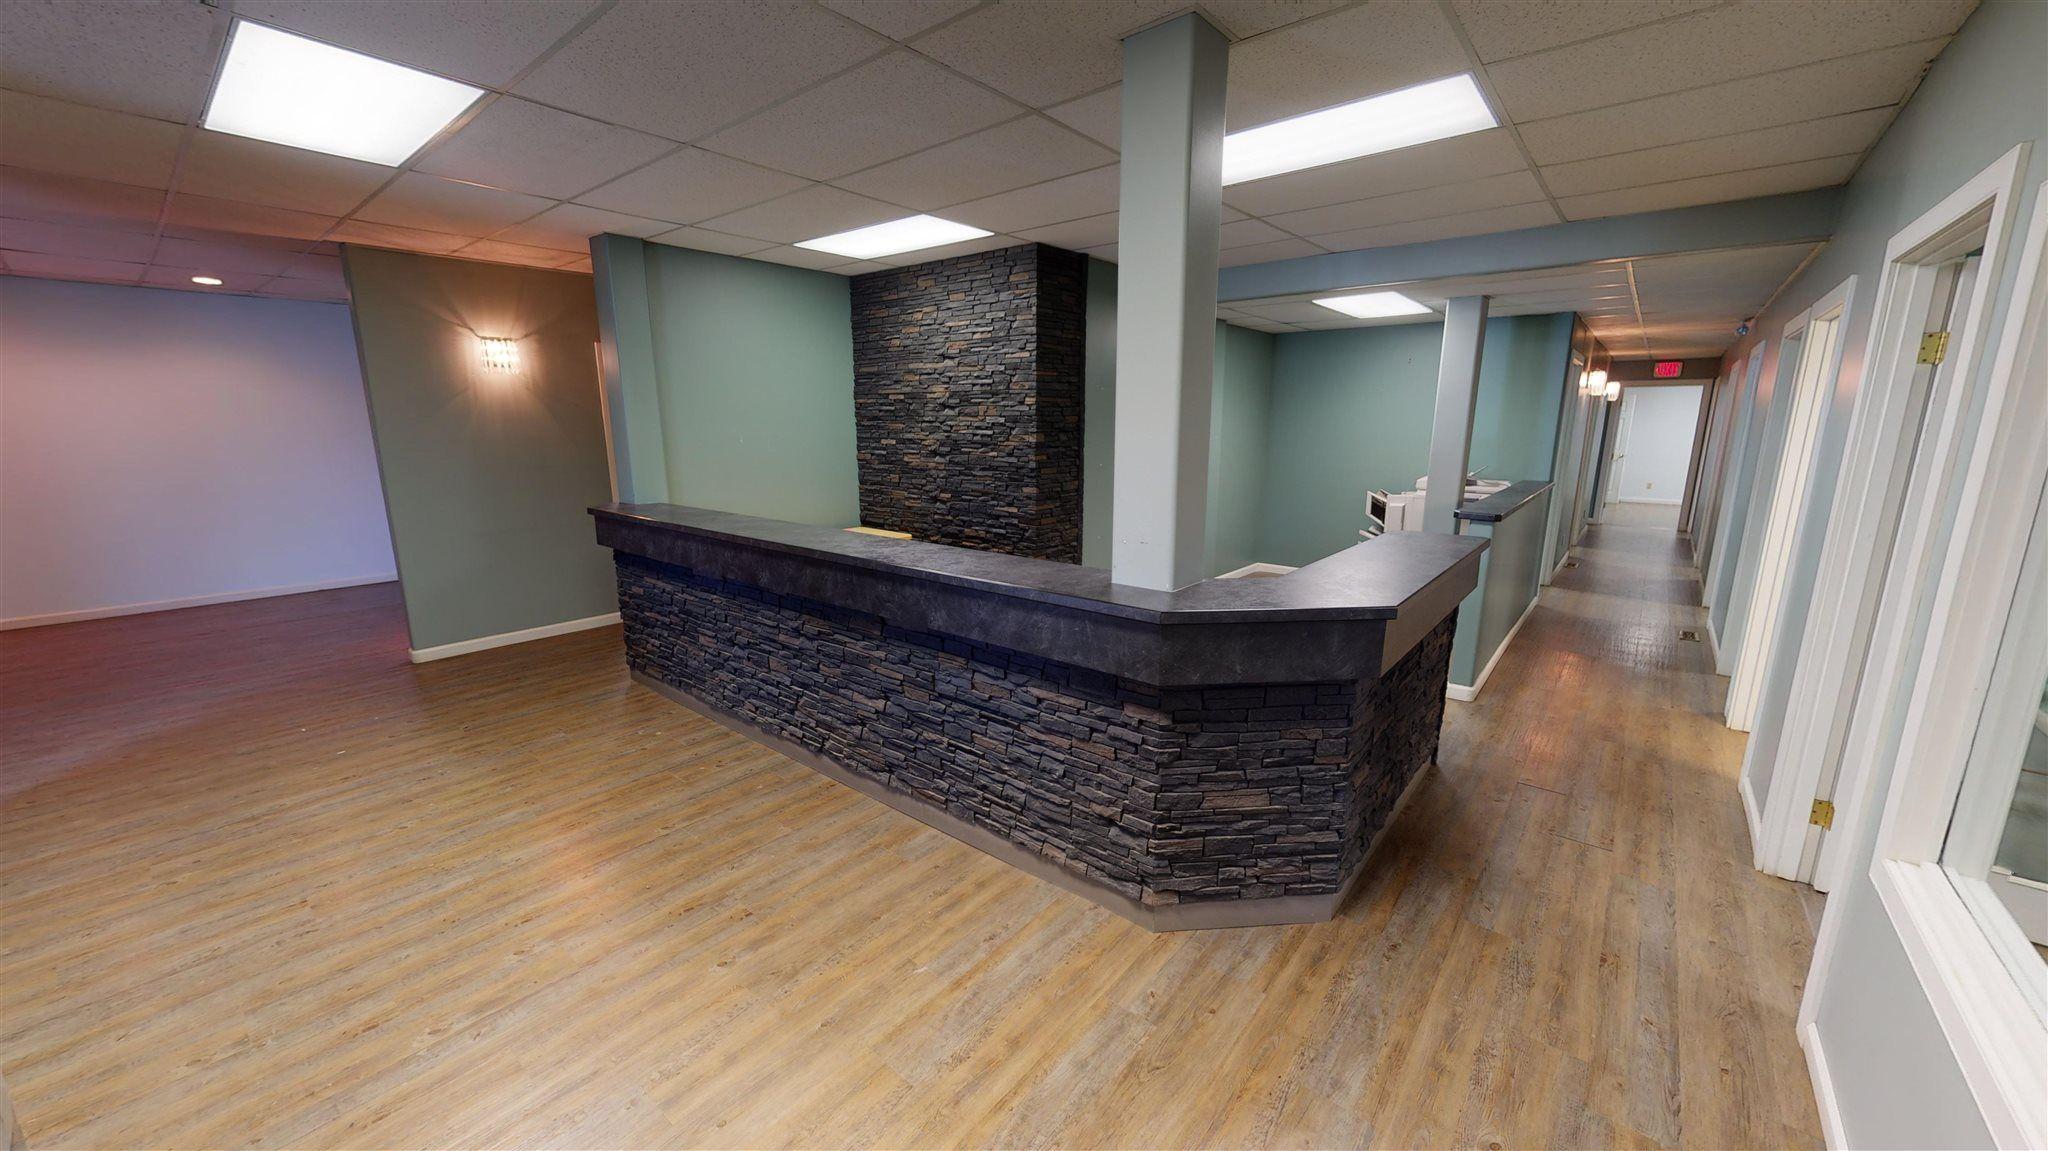 Photo 4: Photos: 10067 100 Avenue in Fort St. John: Fort St. John - City NW Office for sale (Fort St. John (Zone 60))  : MLS®# C8039097